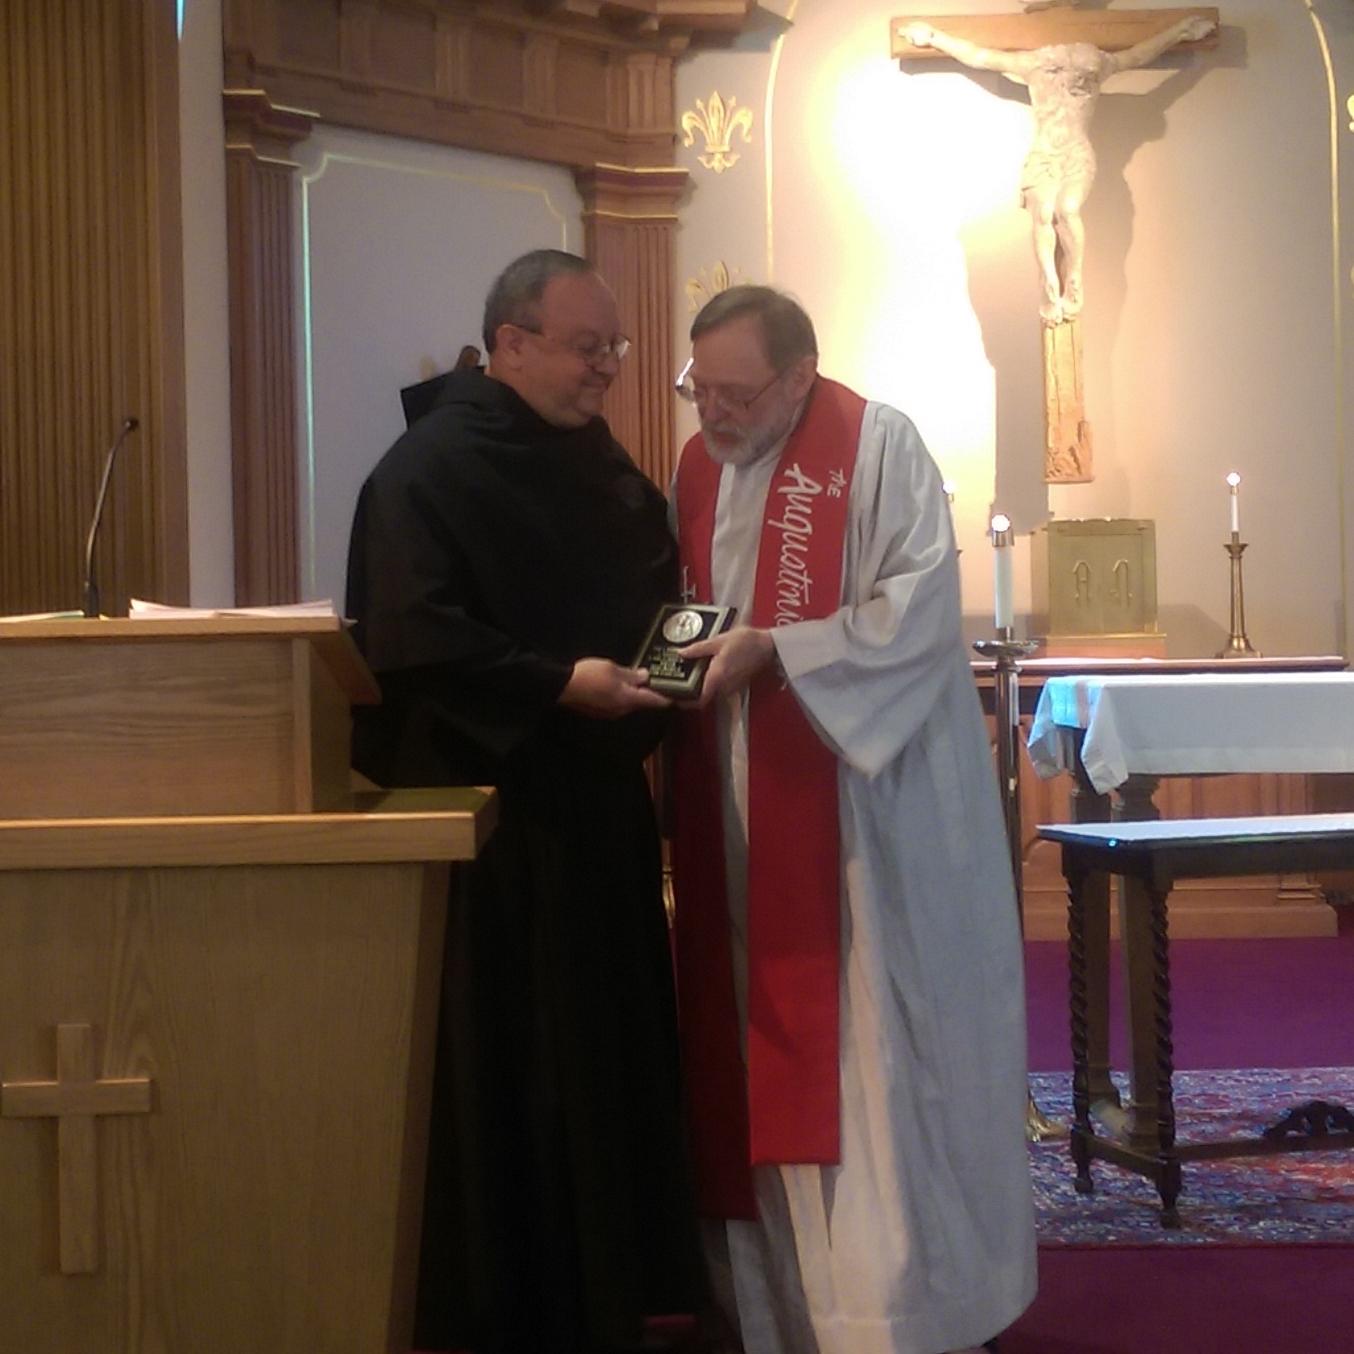 Fr. Terry Deffenbaugh, OSA